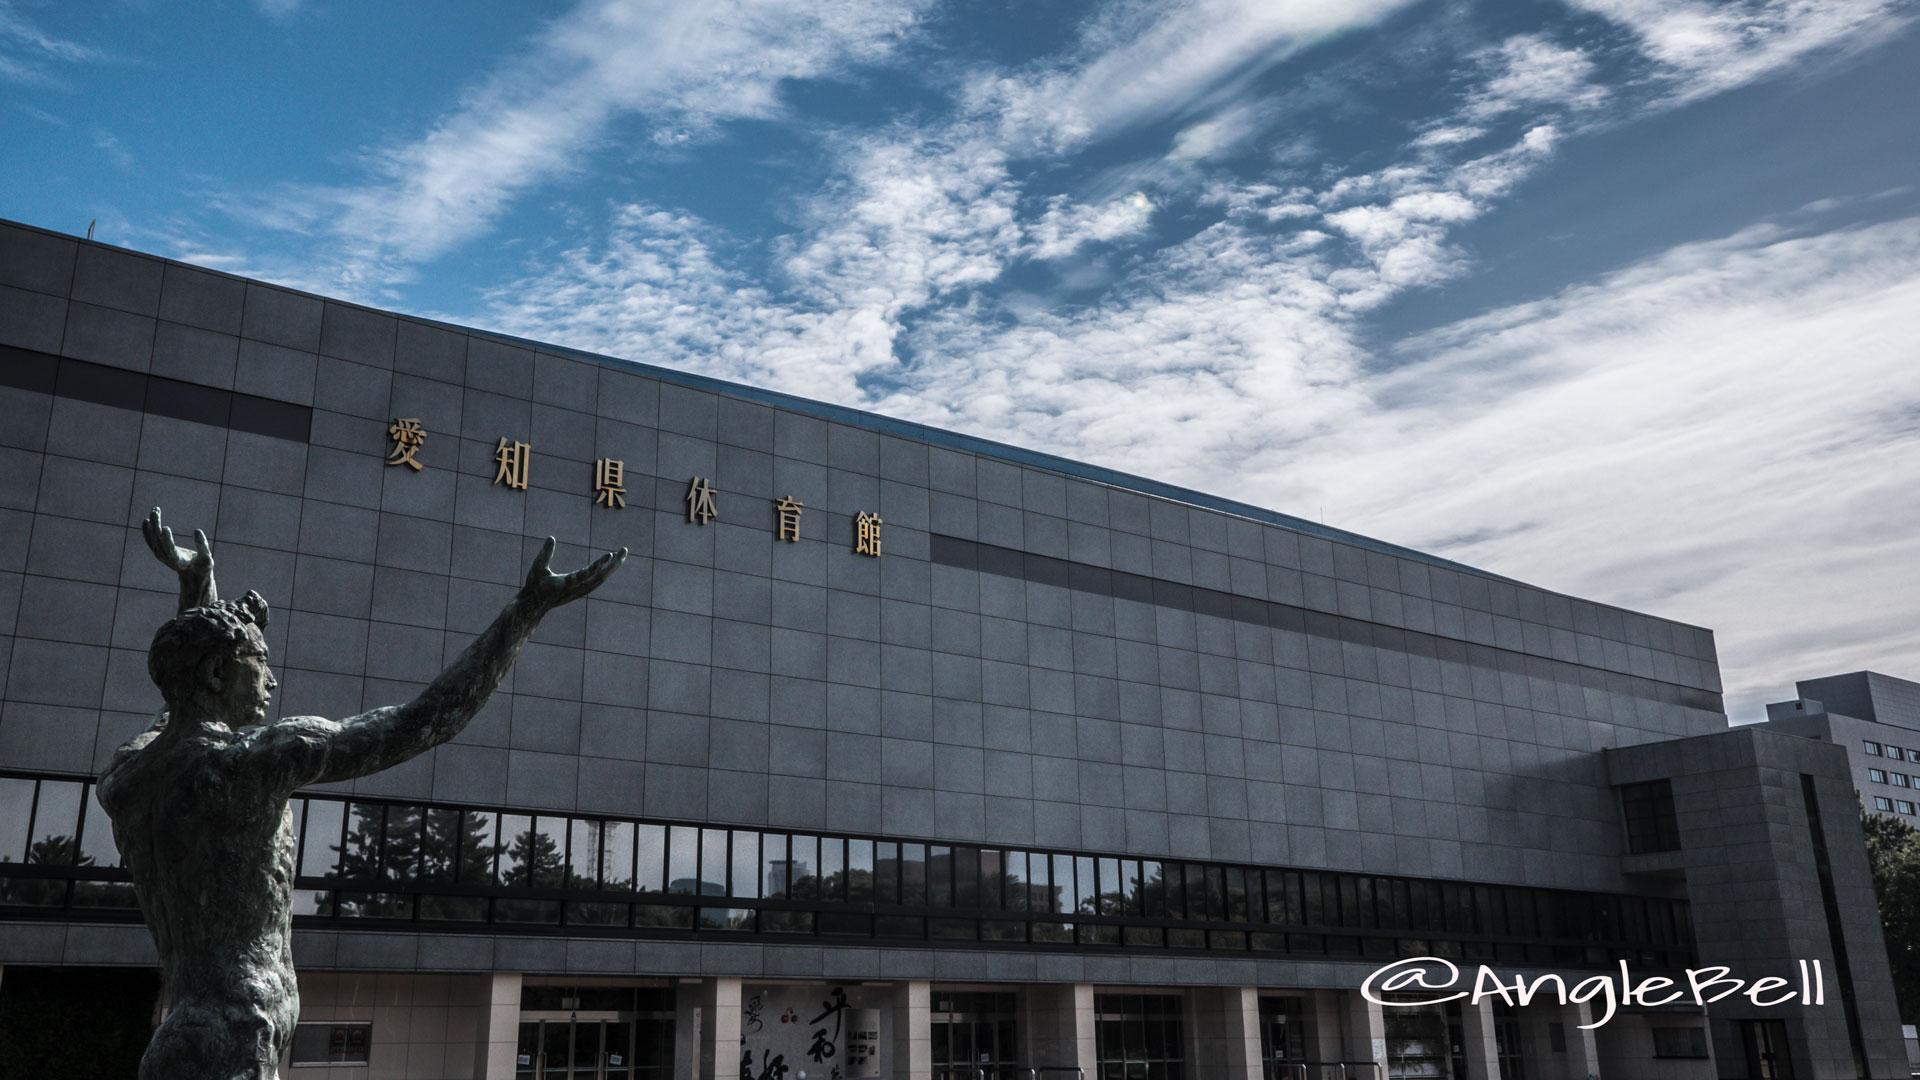 愛知県体育館 伸の像